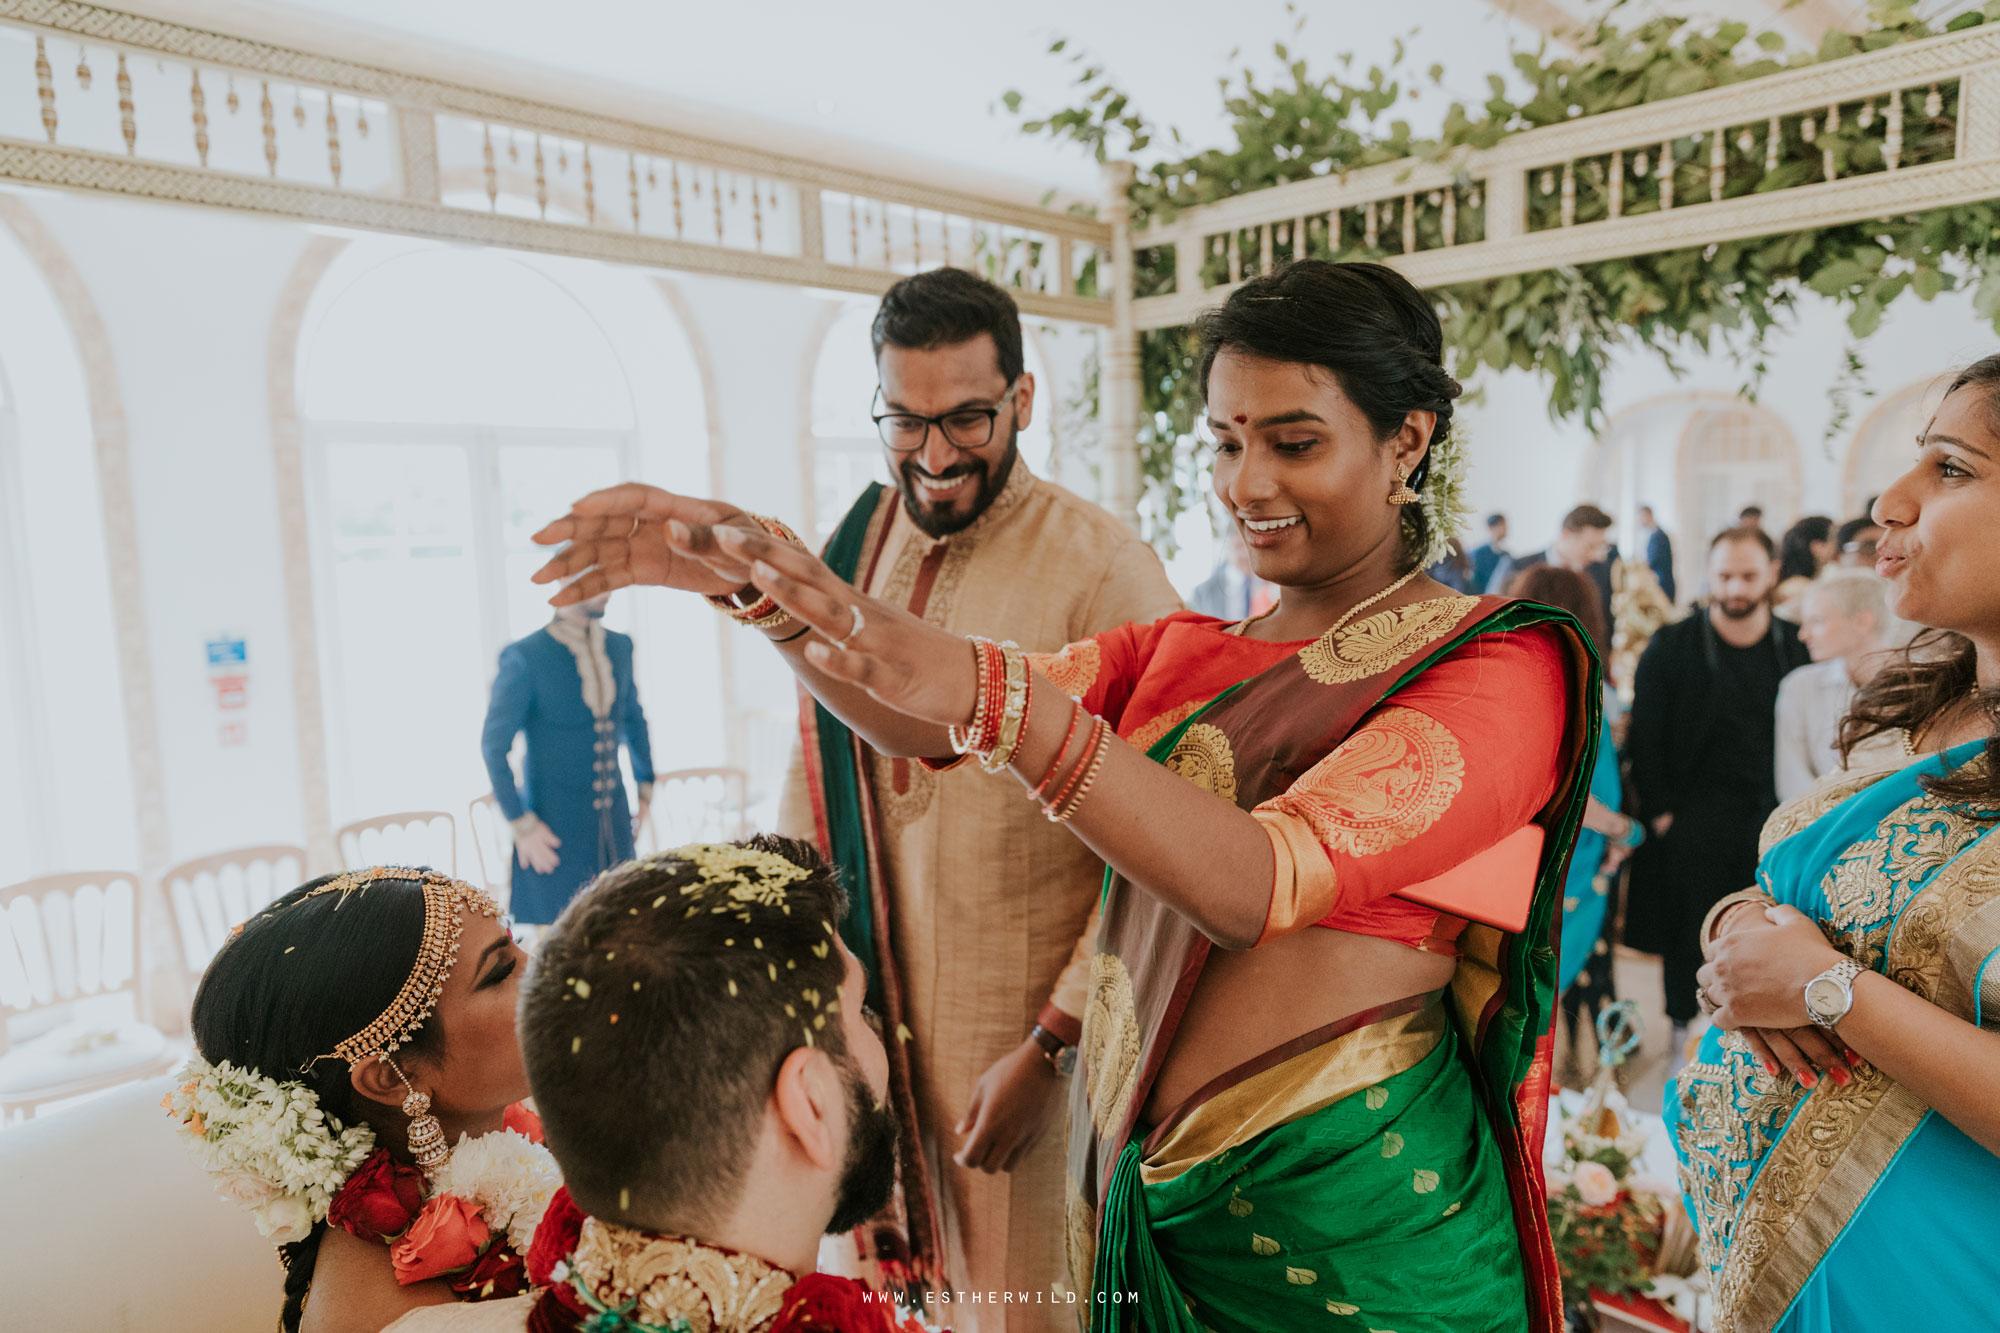 Northbrook_Park_Farnham_Surrey_London_Wedding_Hindu_Fusion_Esther_Wild_Photographer_IMG_5155.jpg